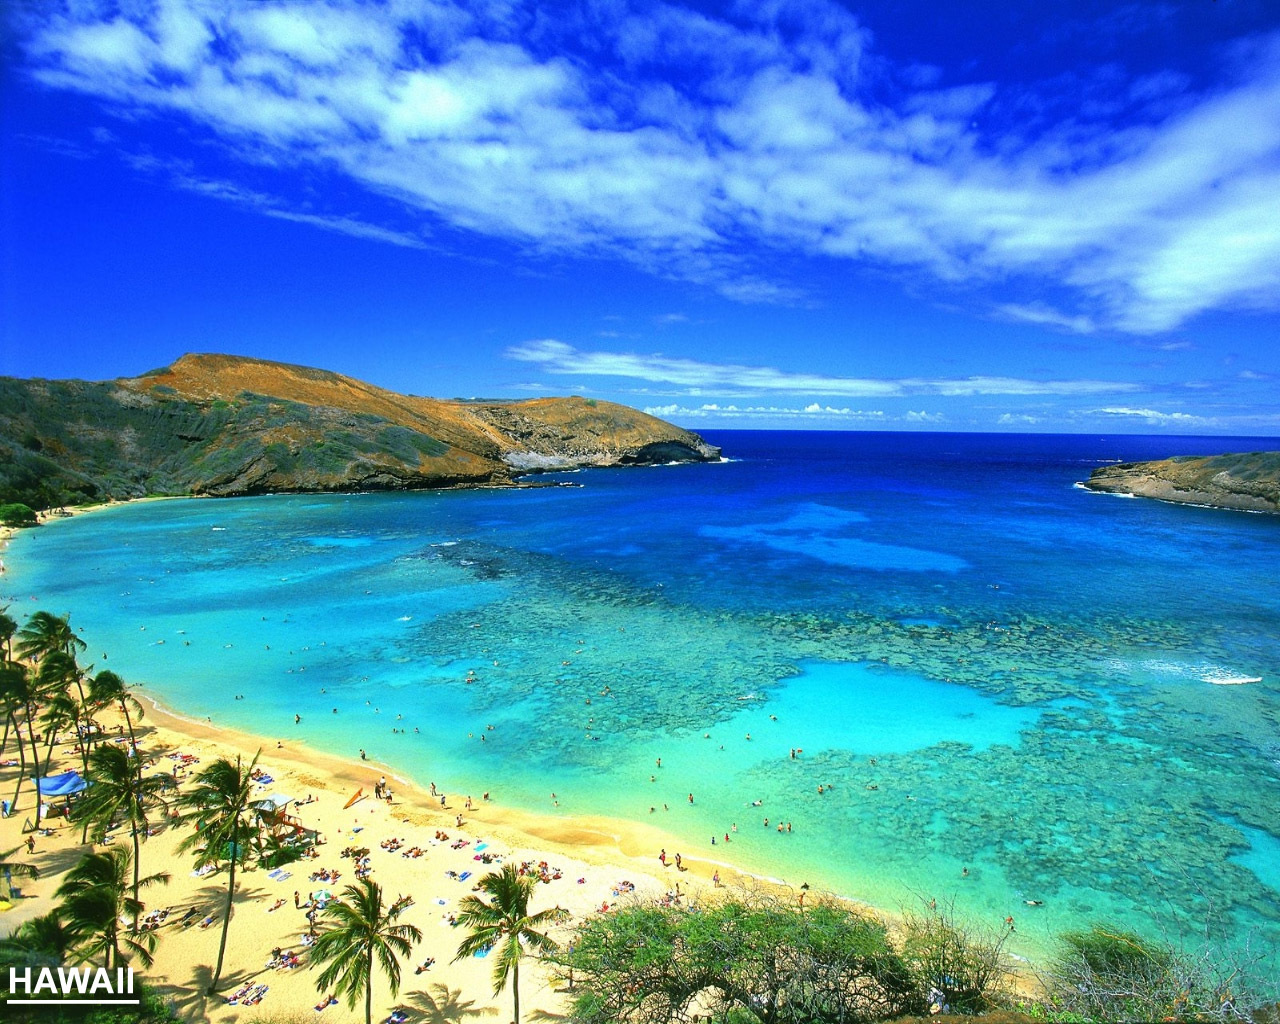 Free download Hawaii Wallpaper HD